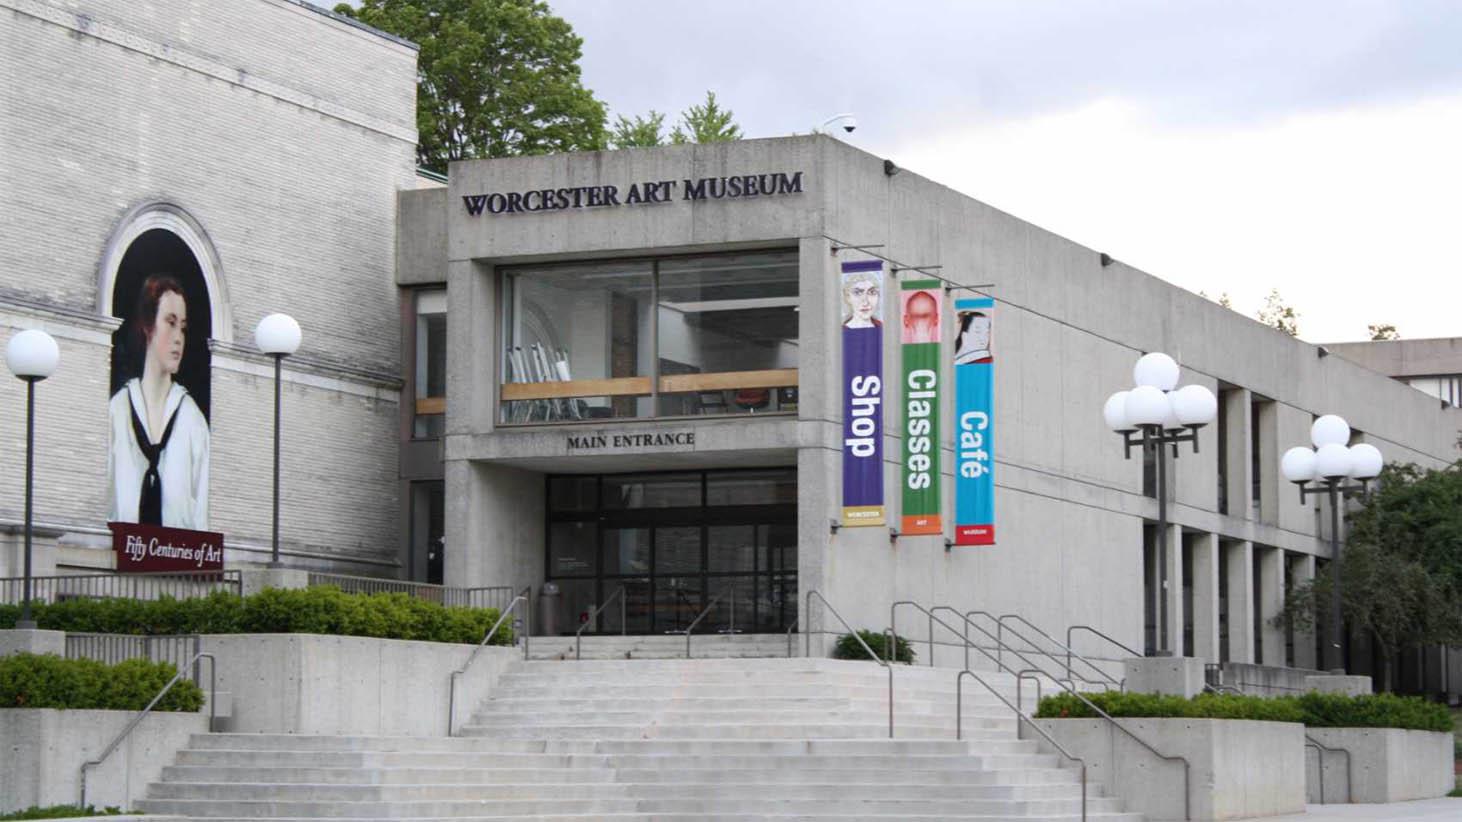 Worcester Art Museum (Worcester)